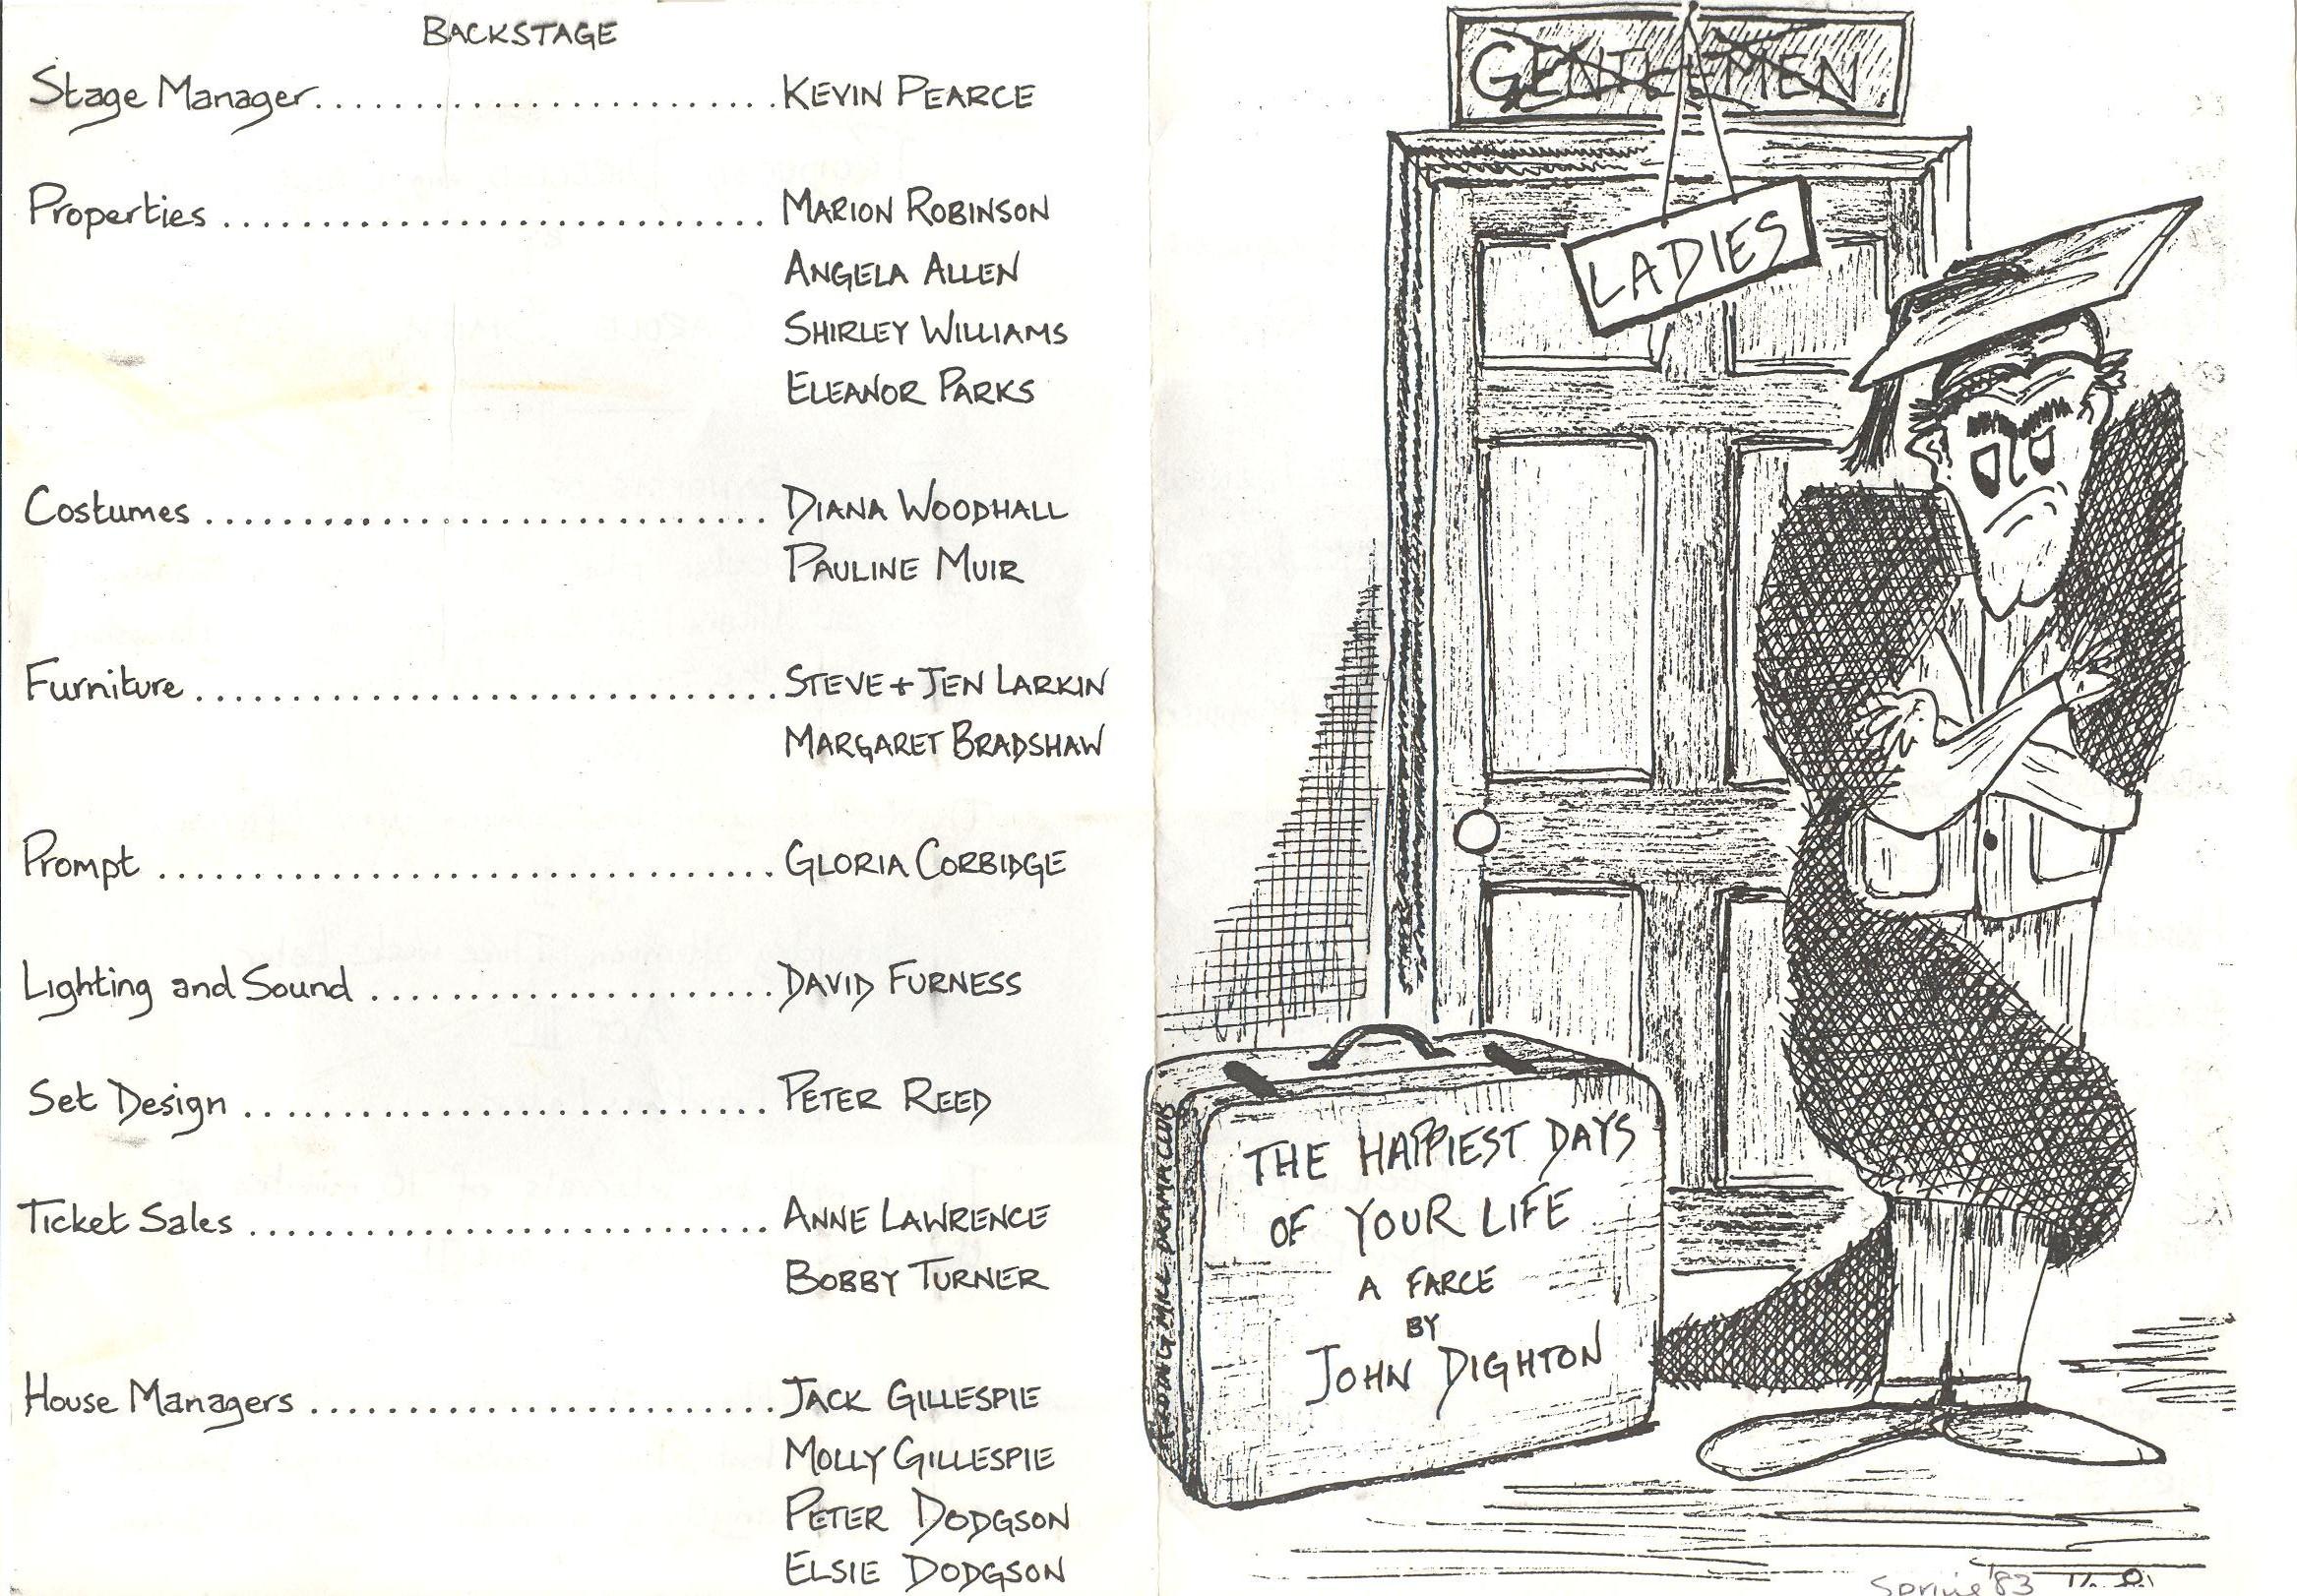 1983 Riding Mill Drama Club, The Happies